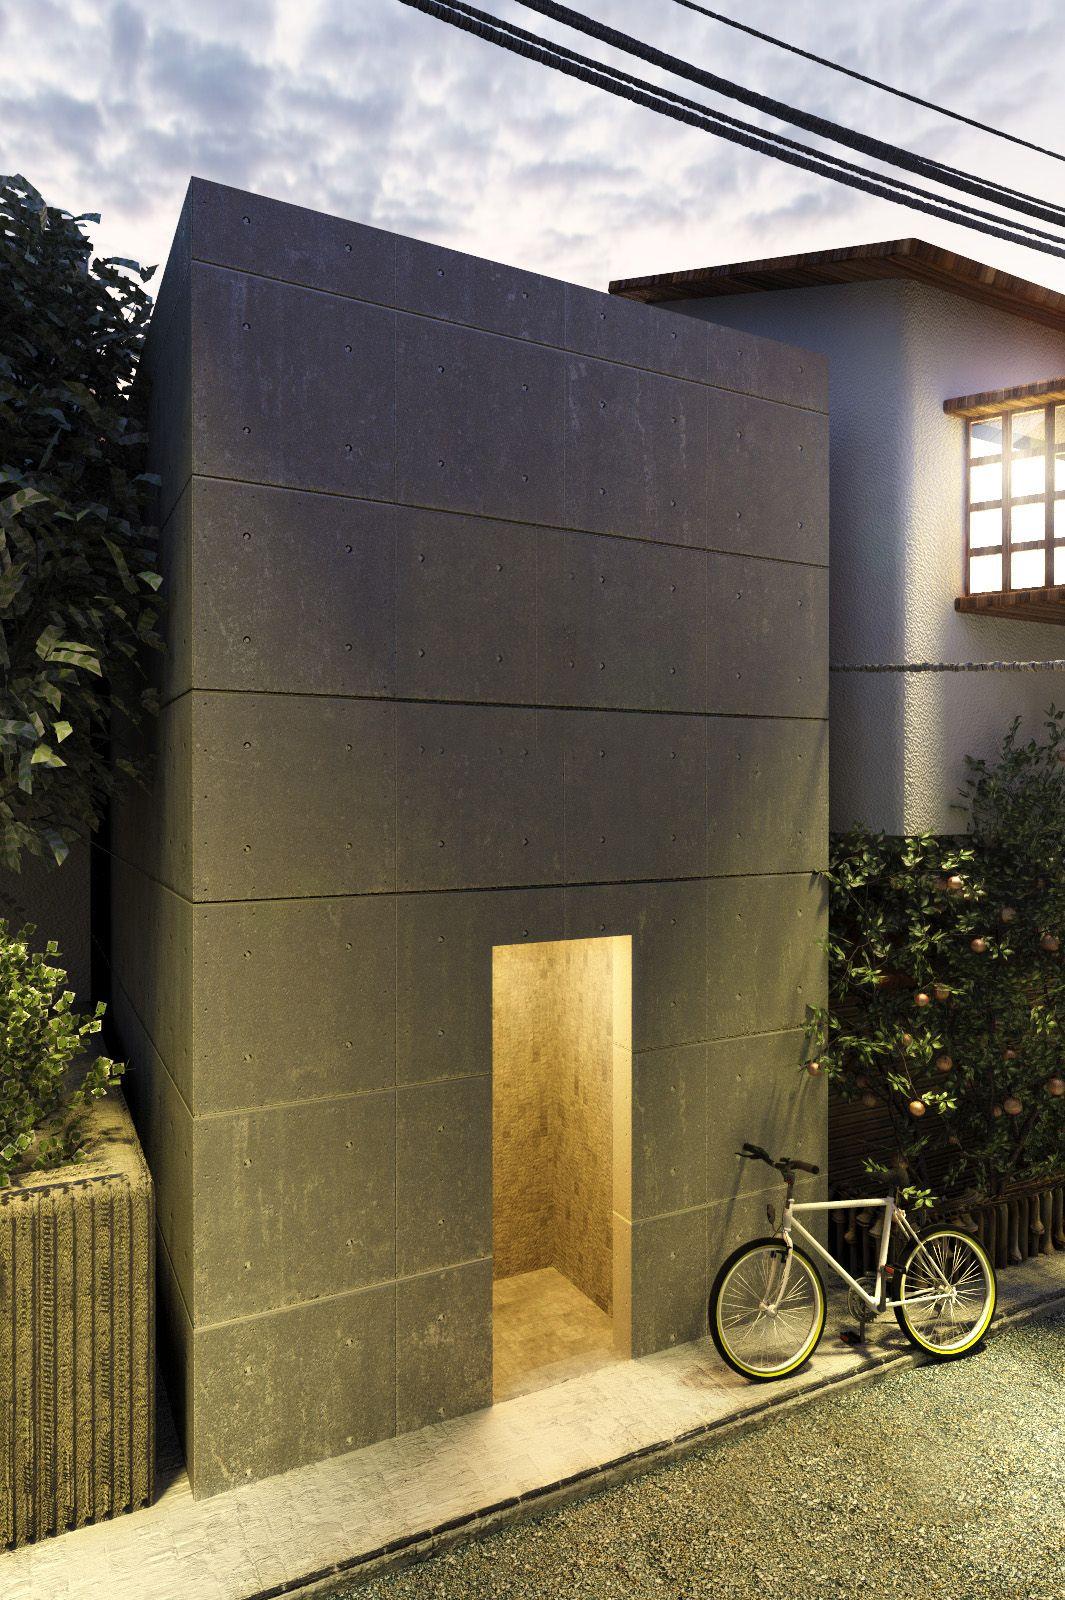 azuma house tadao ando flavio filho com architecture pinterest architektur schmale. Black Bedroom Furniture Sets. Home Design Ideas